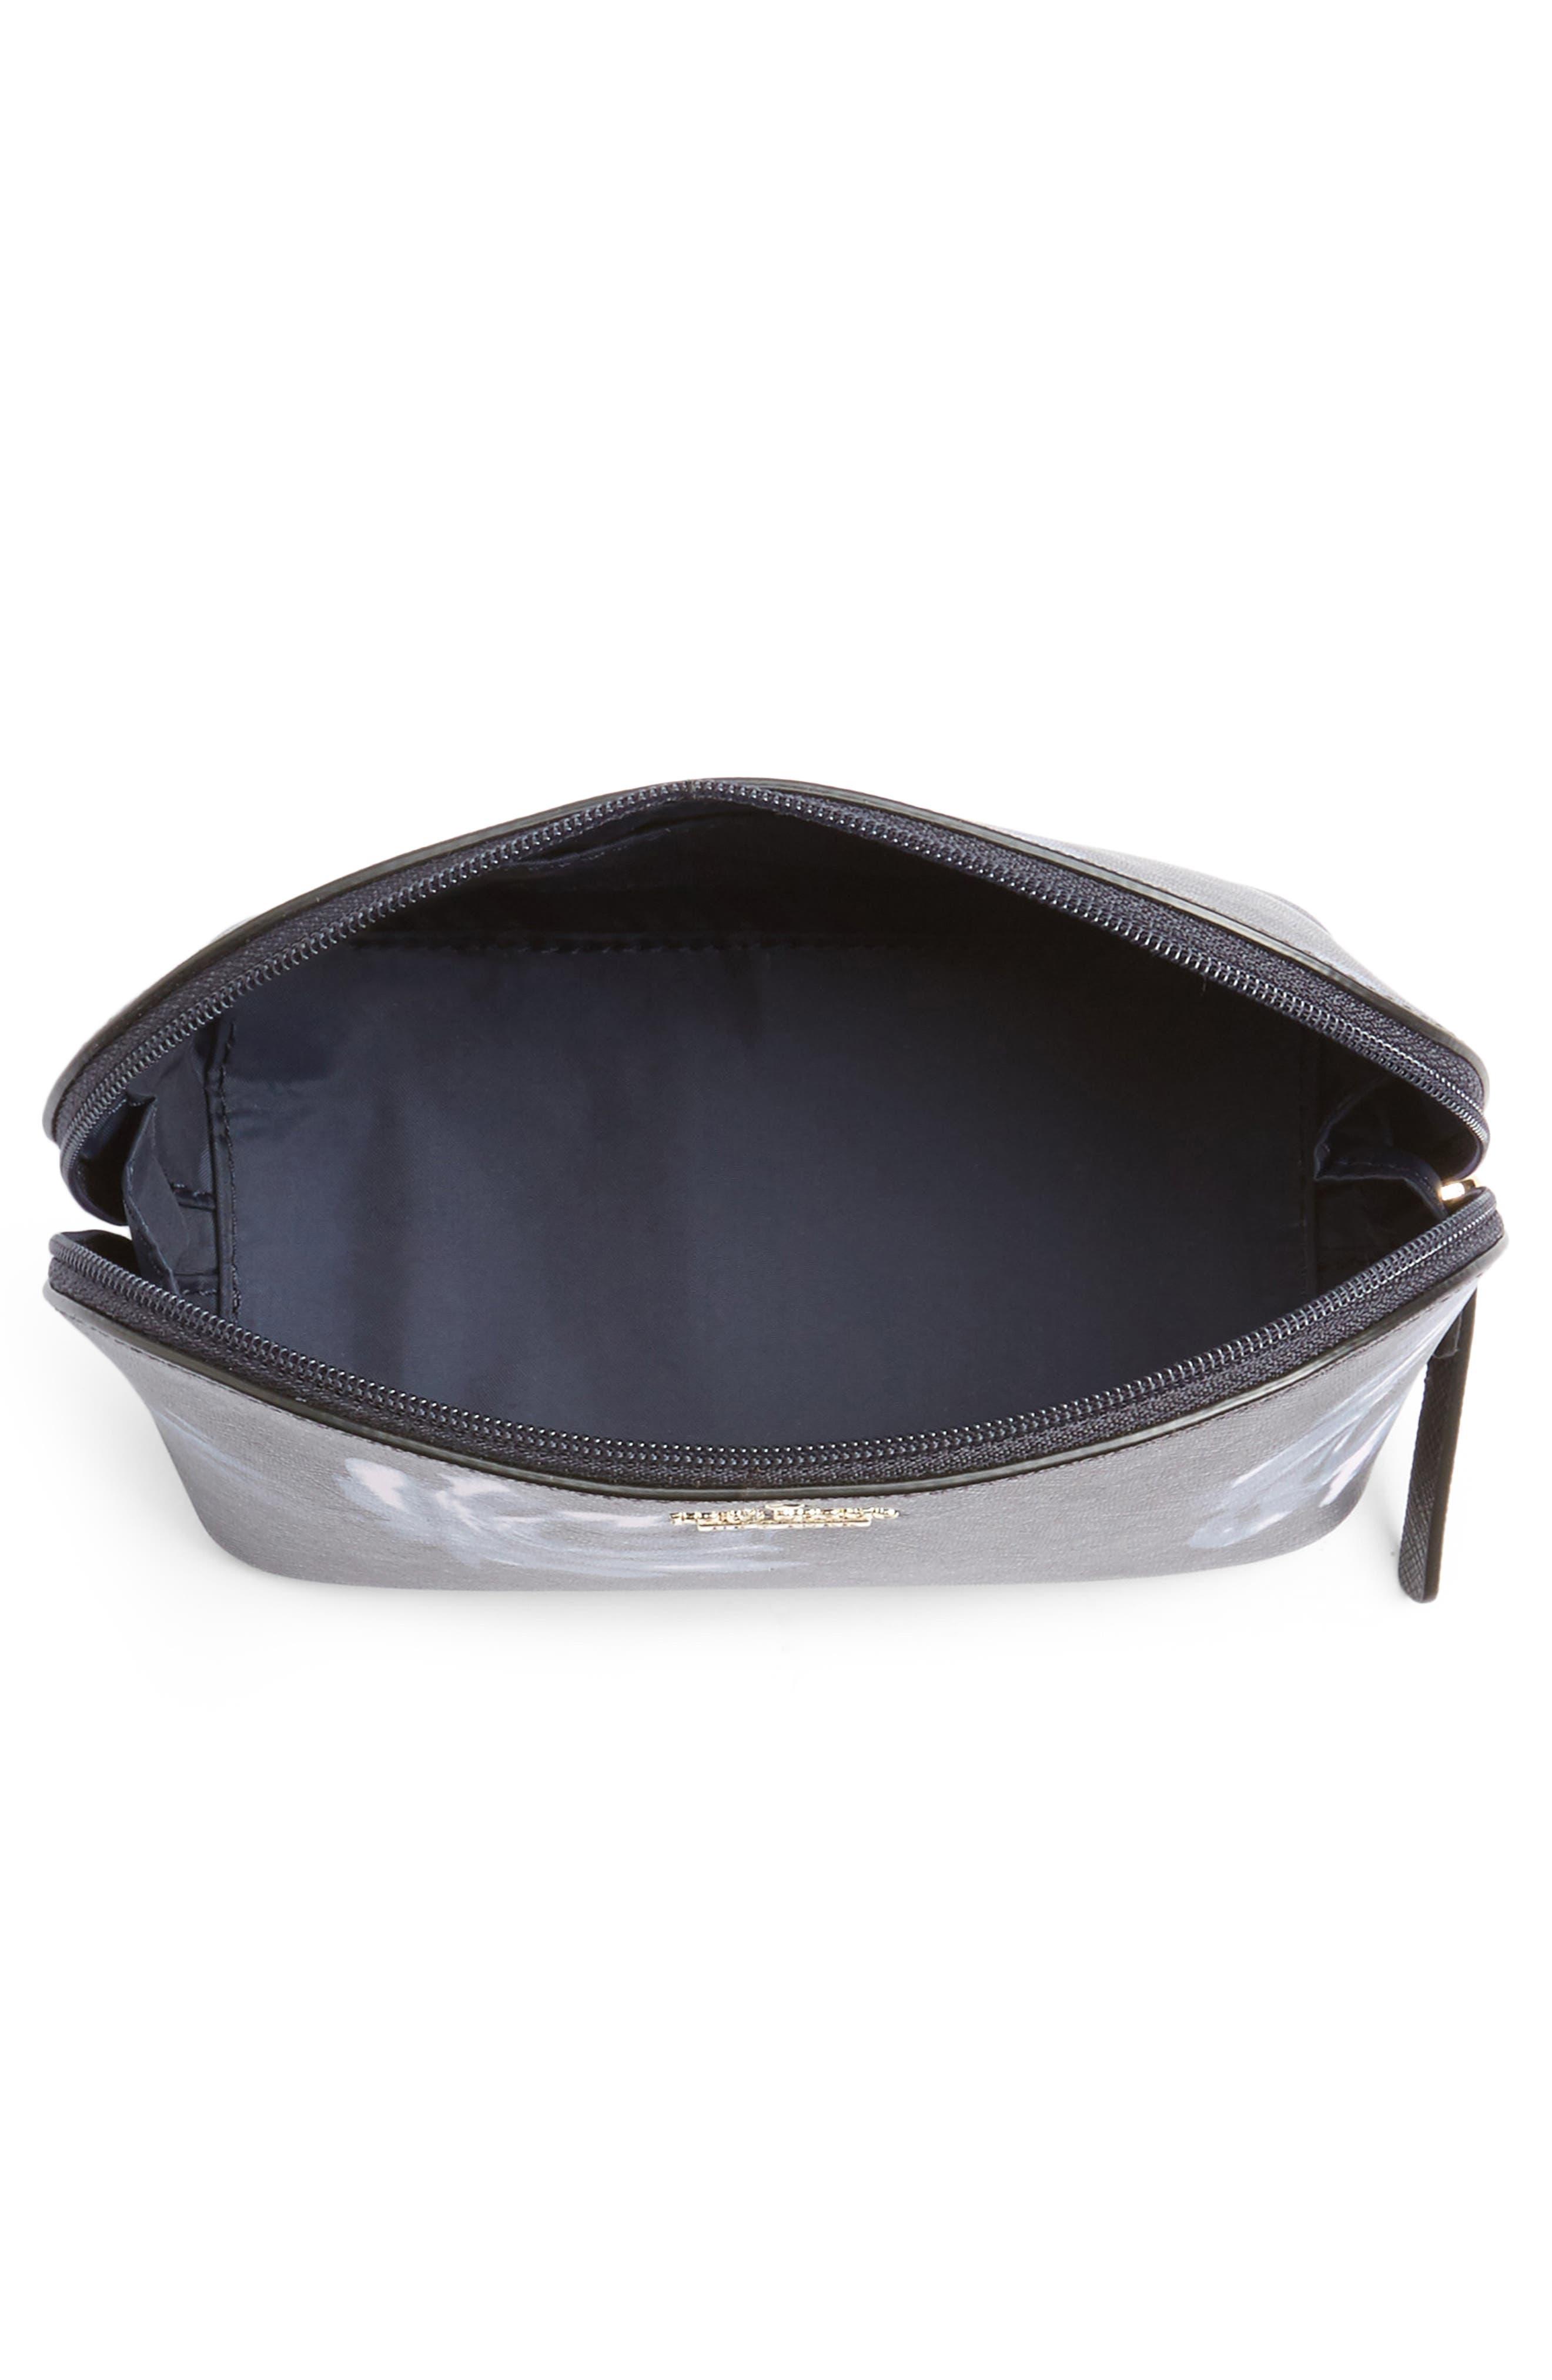 cameron street night rose - small abalene cosmetics bag,                             Alternate thumbnail 3, color,                             Rich Navy Multi